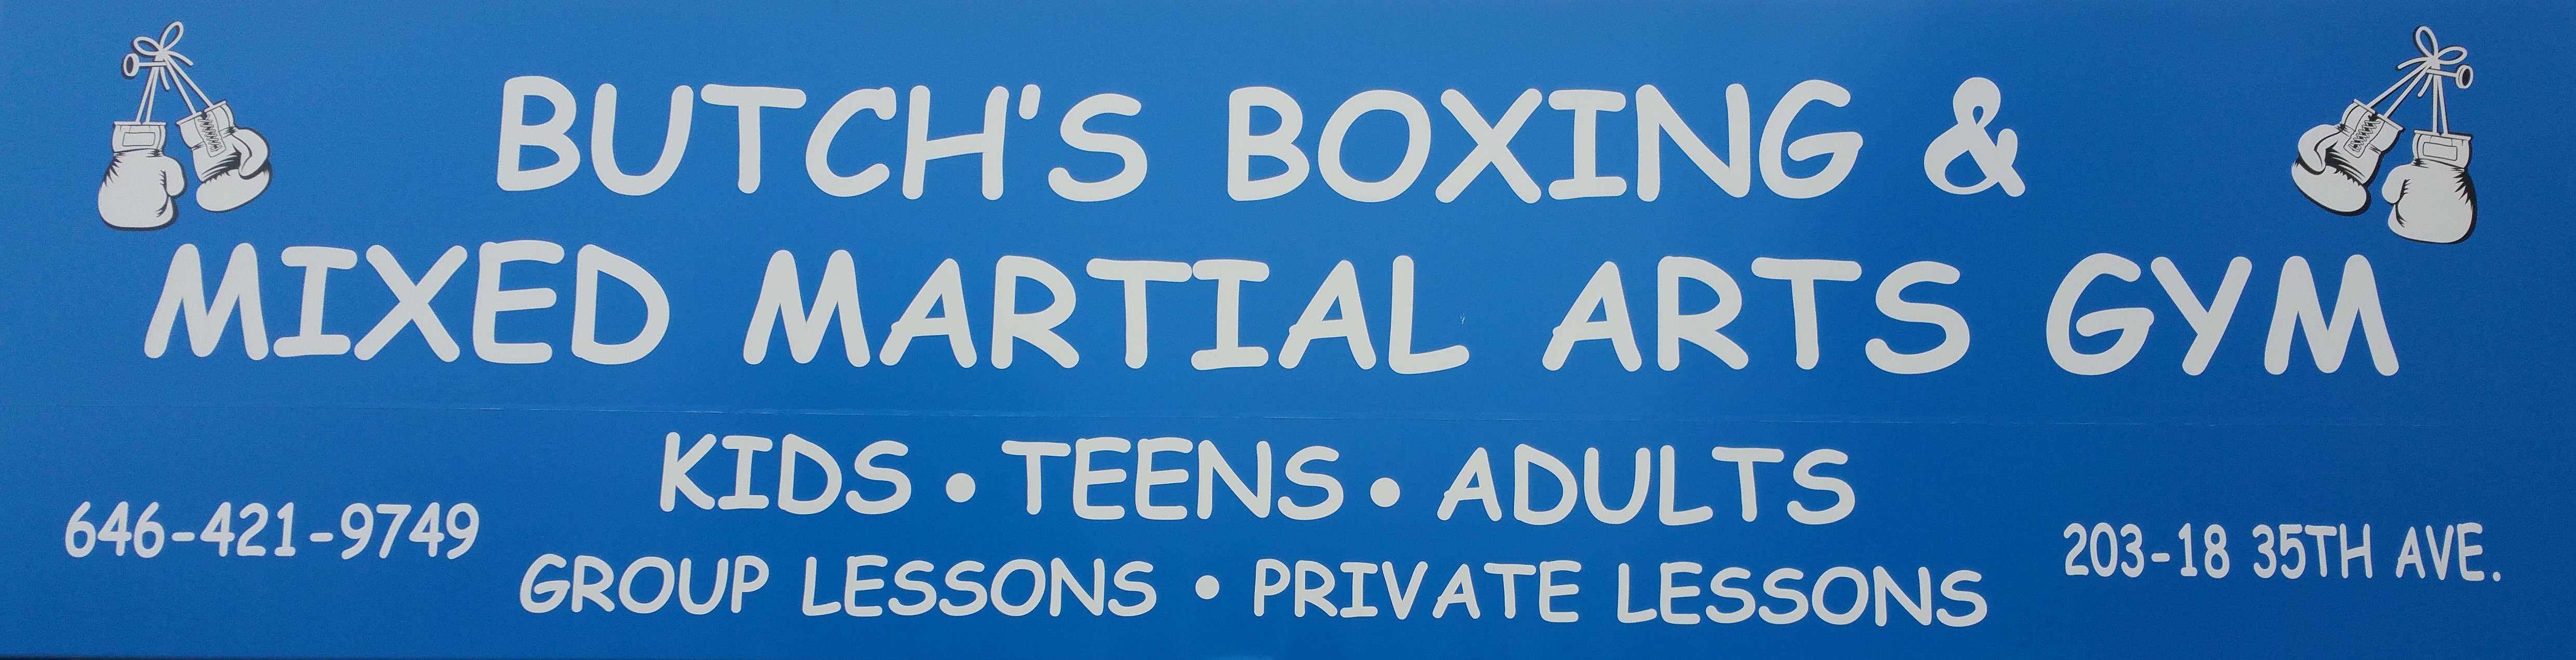 Boxing & MMA Gym in Queens | Boxing & MMA Gym in Queens 646